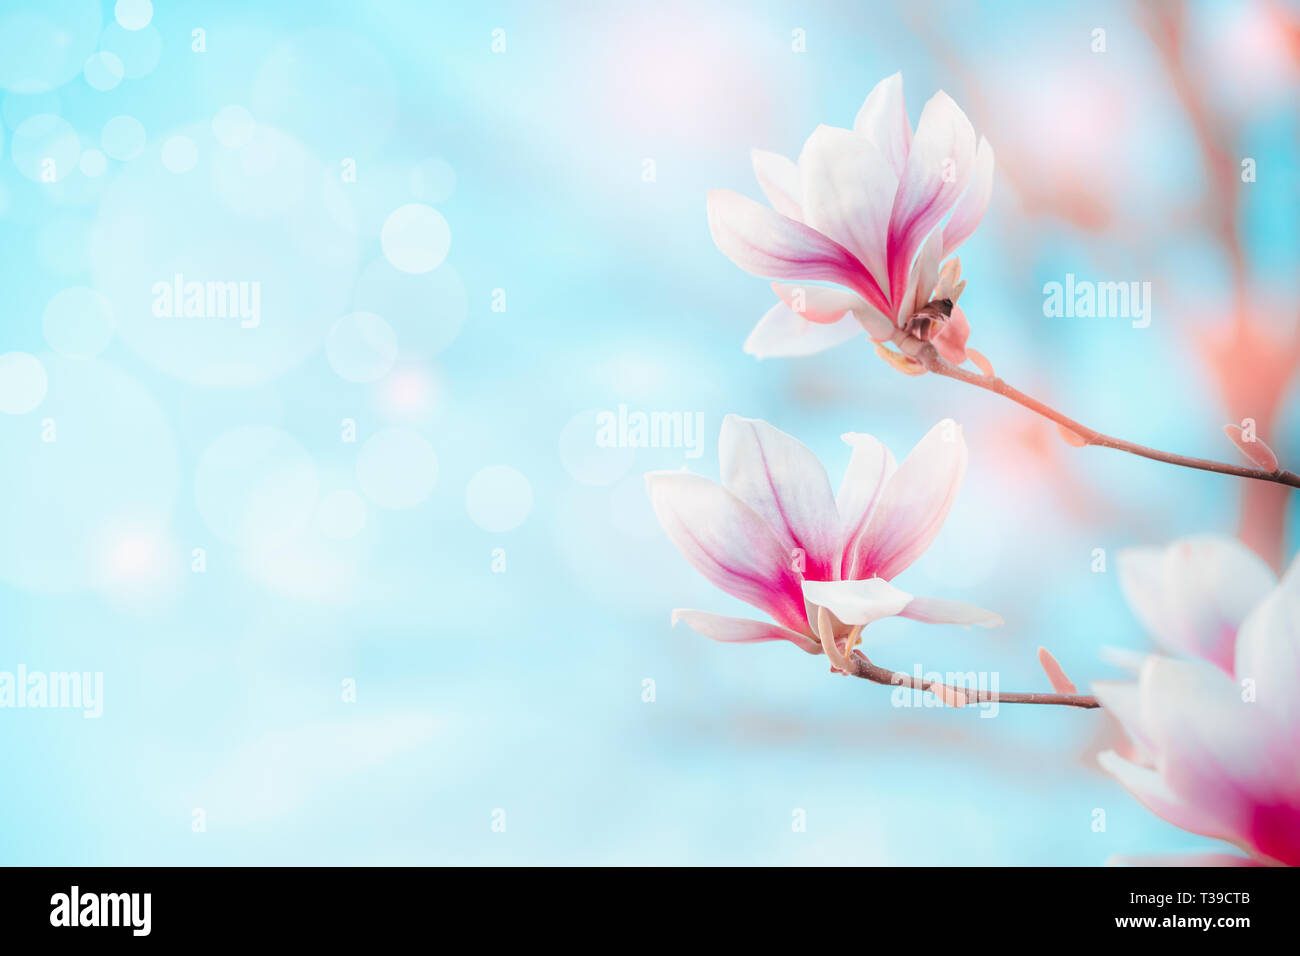 La nature de fond de printemps avec de jolies fleurs de magnolia au ciel bleu avec effet bokeh. Concept de plein air au printemps. Magnolia blossom Banque D'Images